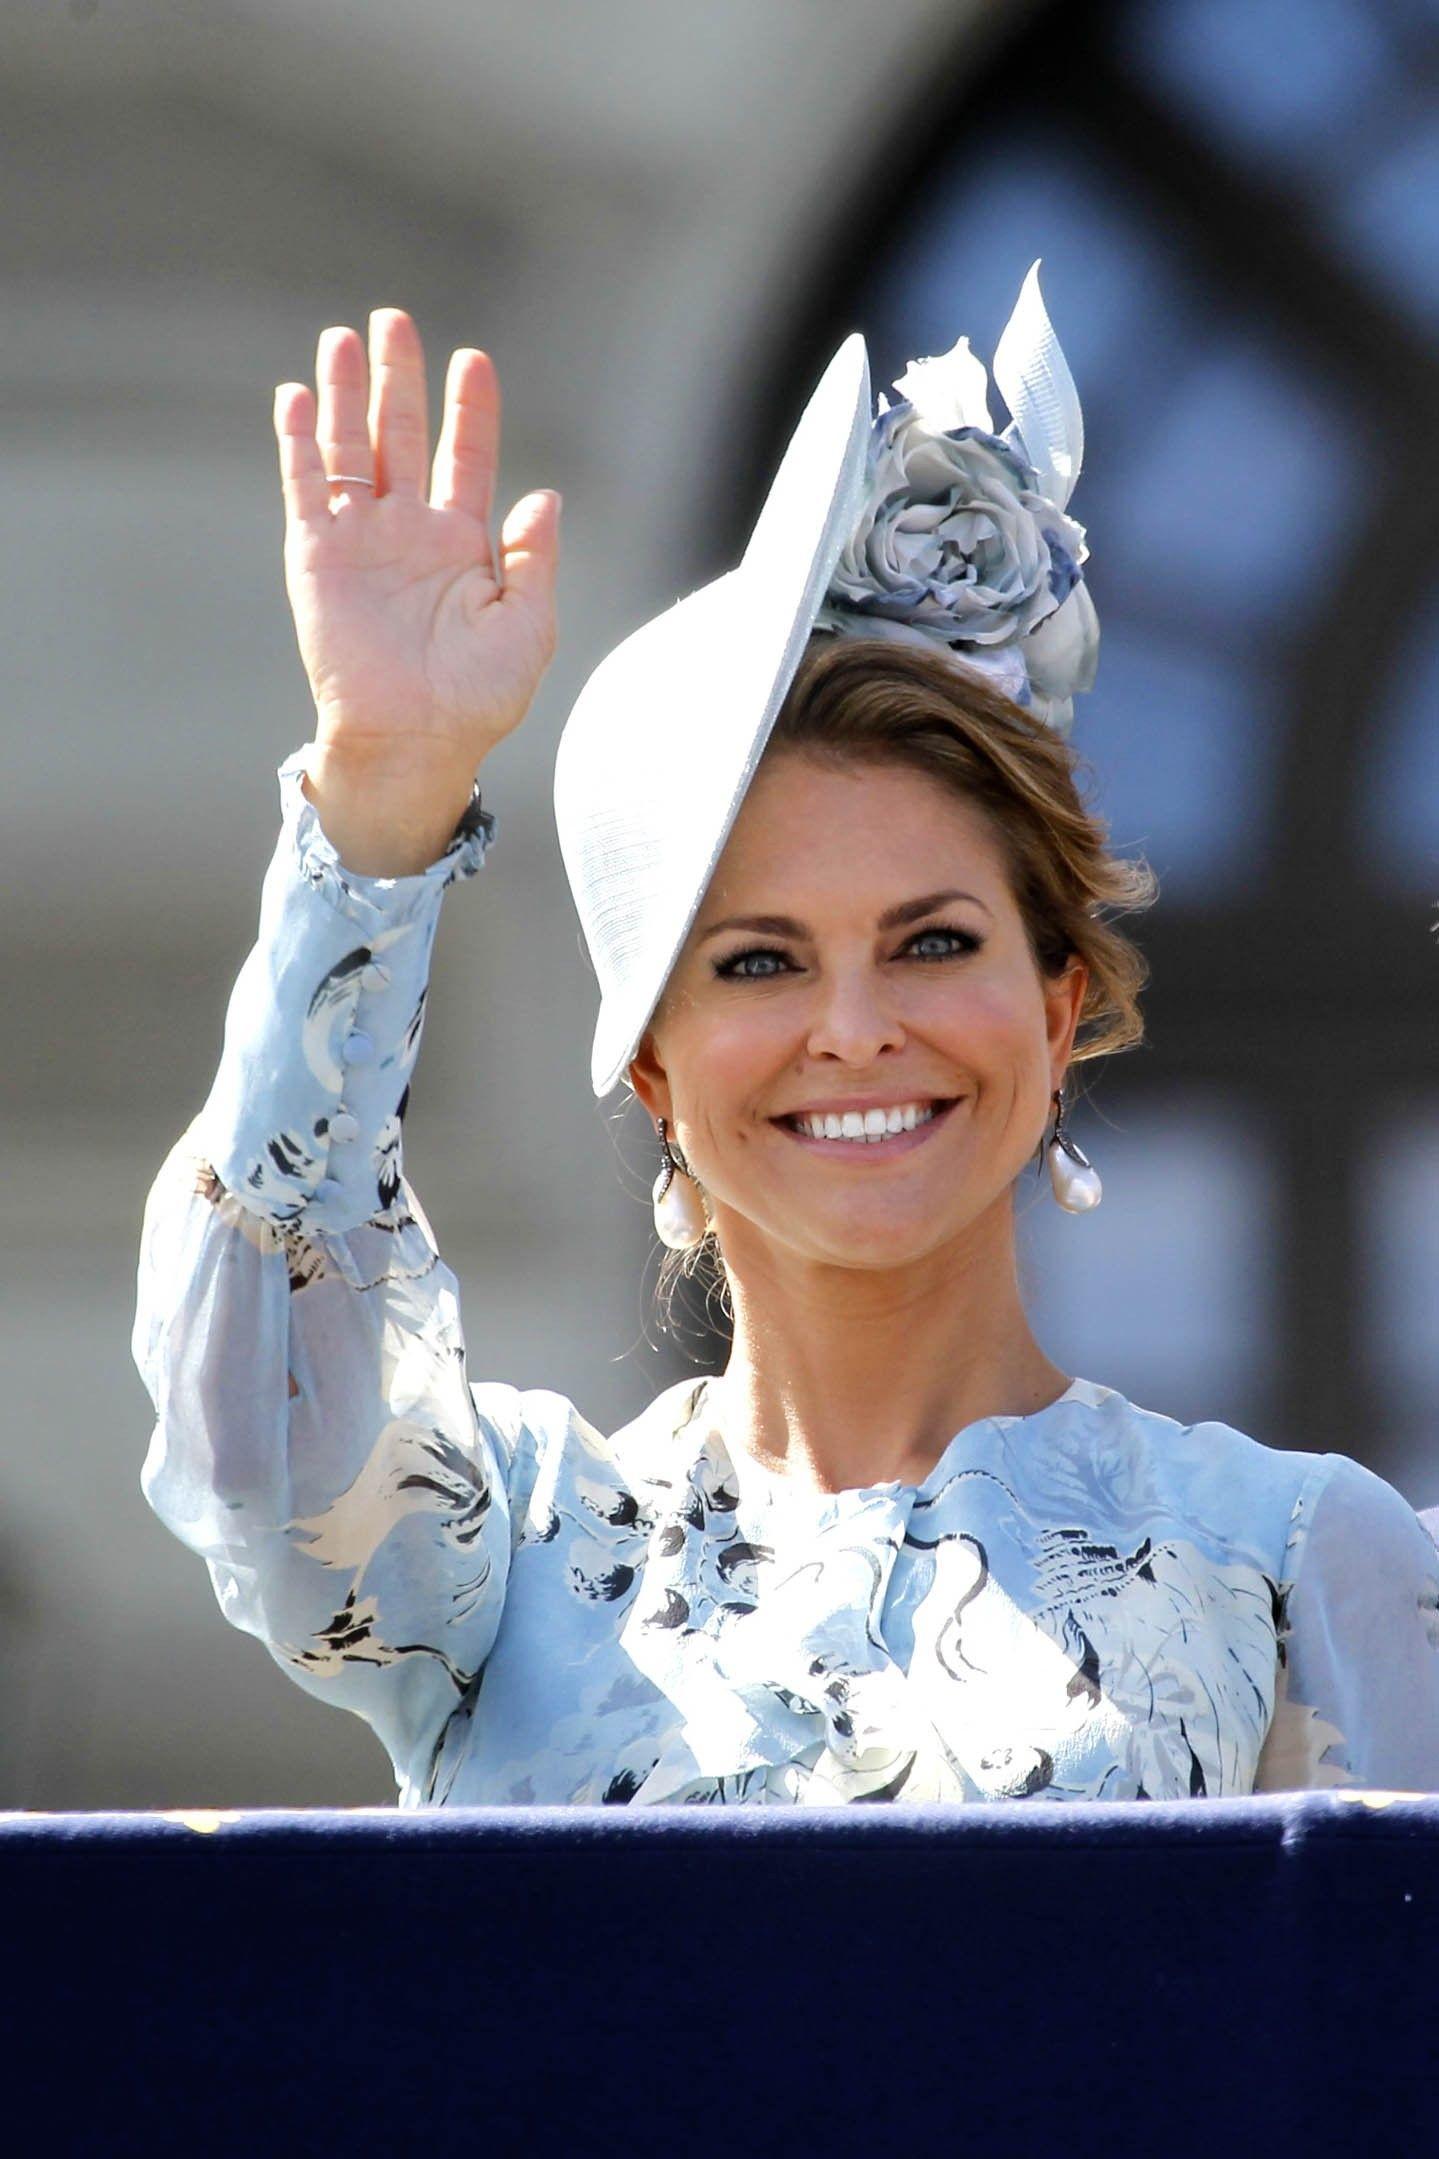 Madeleine 2017 Princess madeleine, Famous celebrities